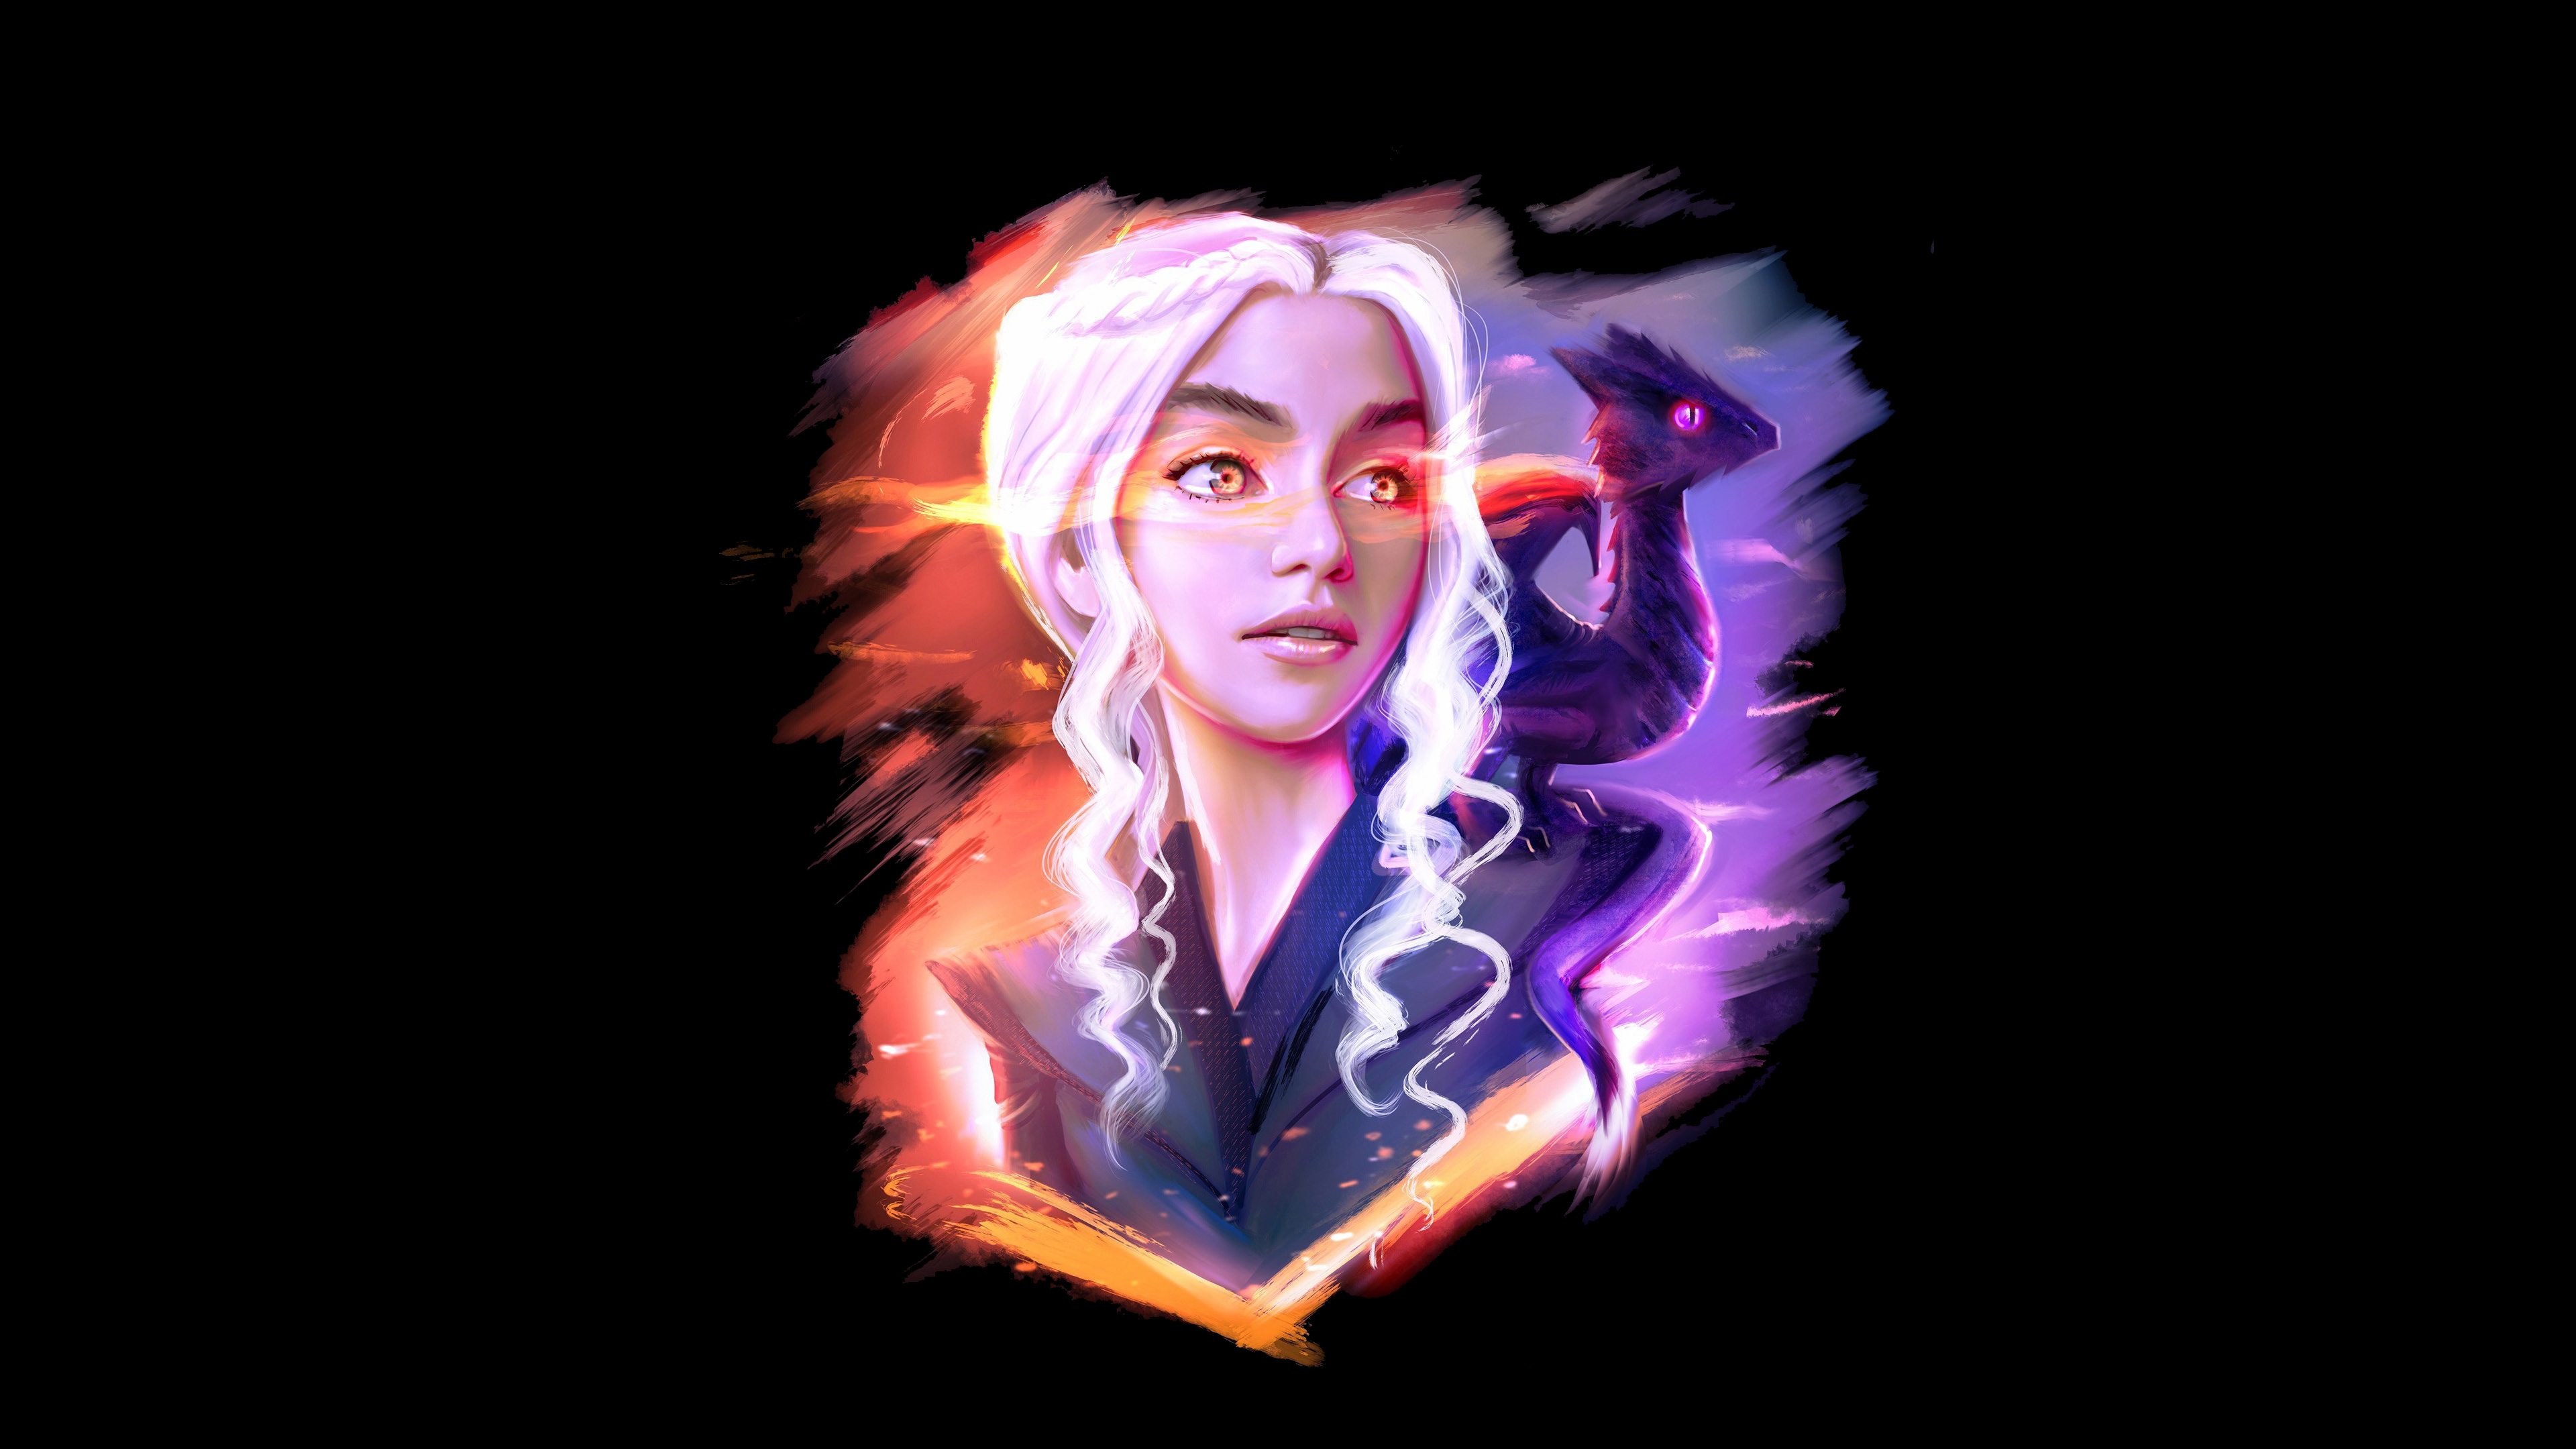 2048x2048 Anthem Ipad Air Hd 4k Wallpapers Images: 2048x2048 Daenerys Targaryen And Dragon Fan Art Ipad Air